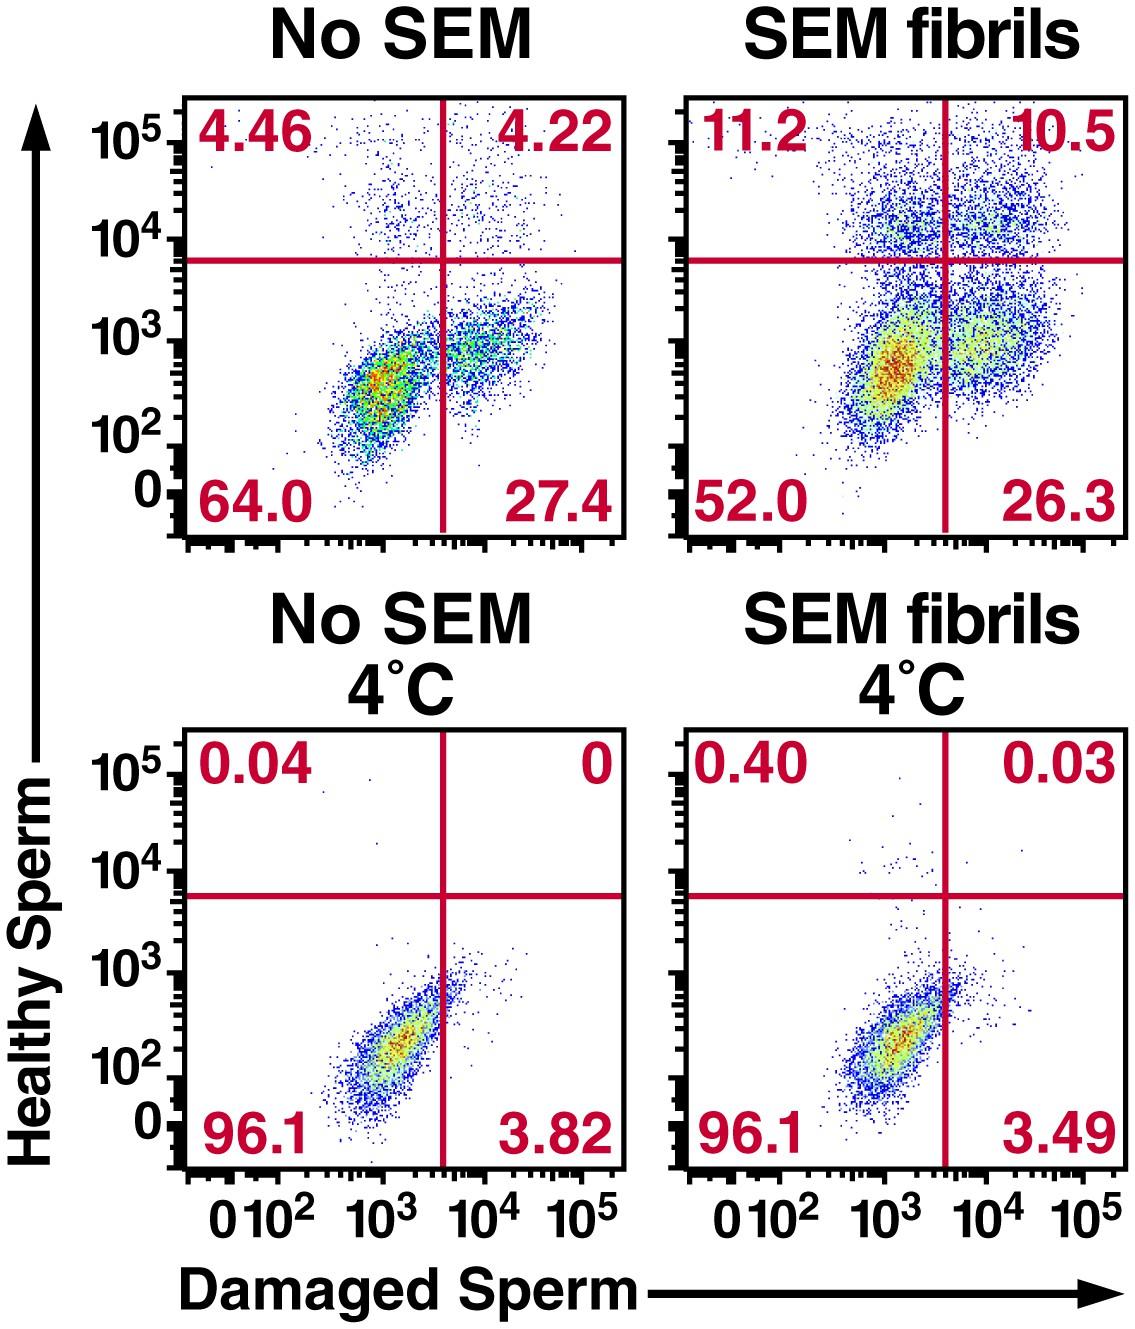 Semen amyloids participate in spermatozoa selection and